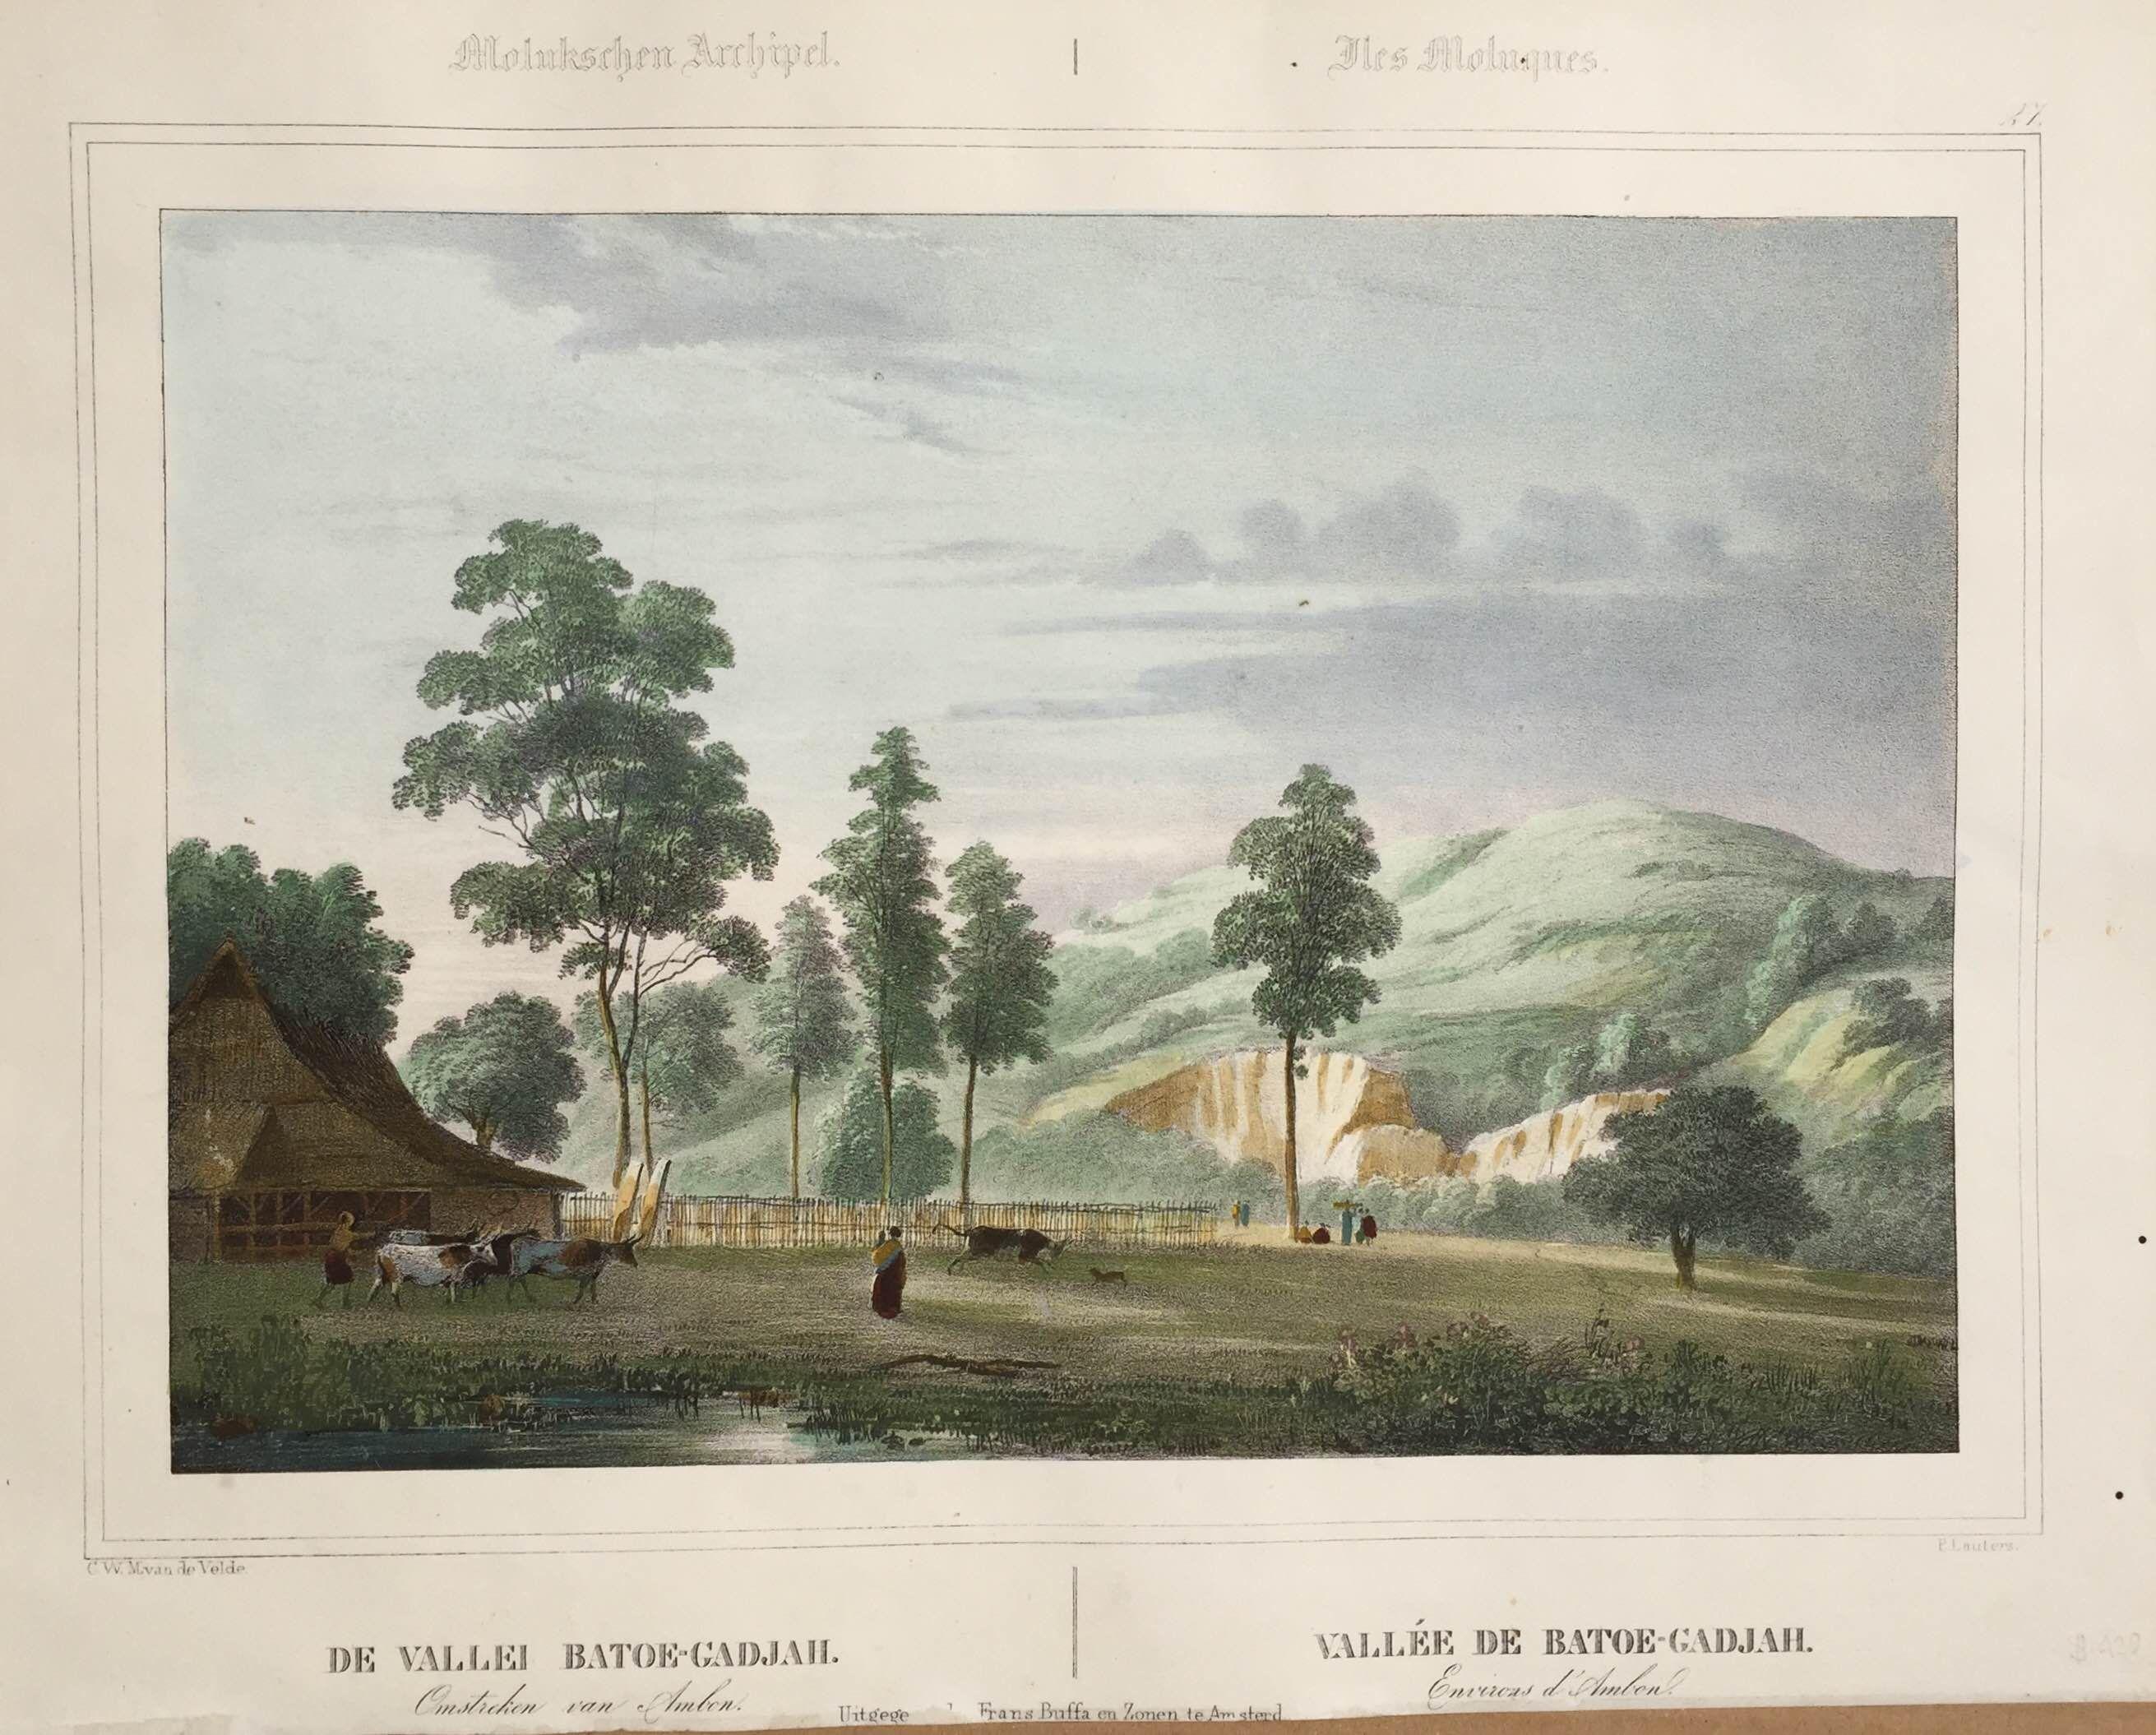 De vaillei Batoe-Gadjah Ambon circa 1845 - Litho Paulus Lauters (1806-1875).